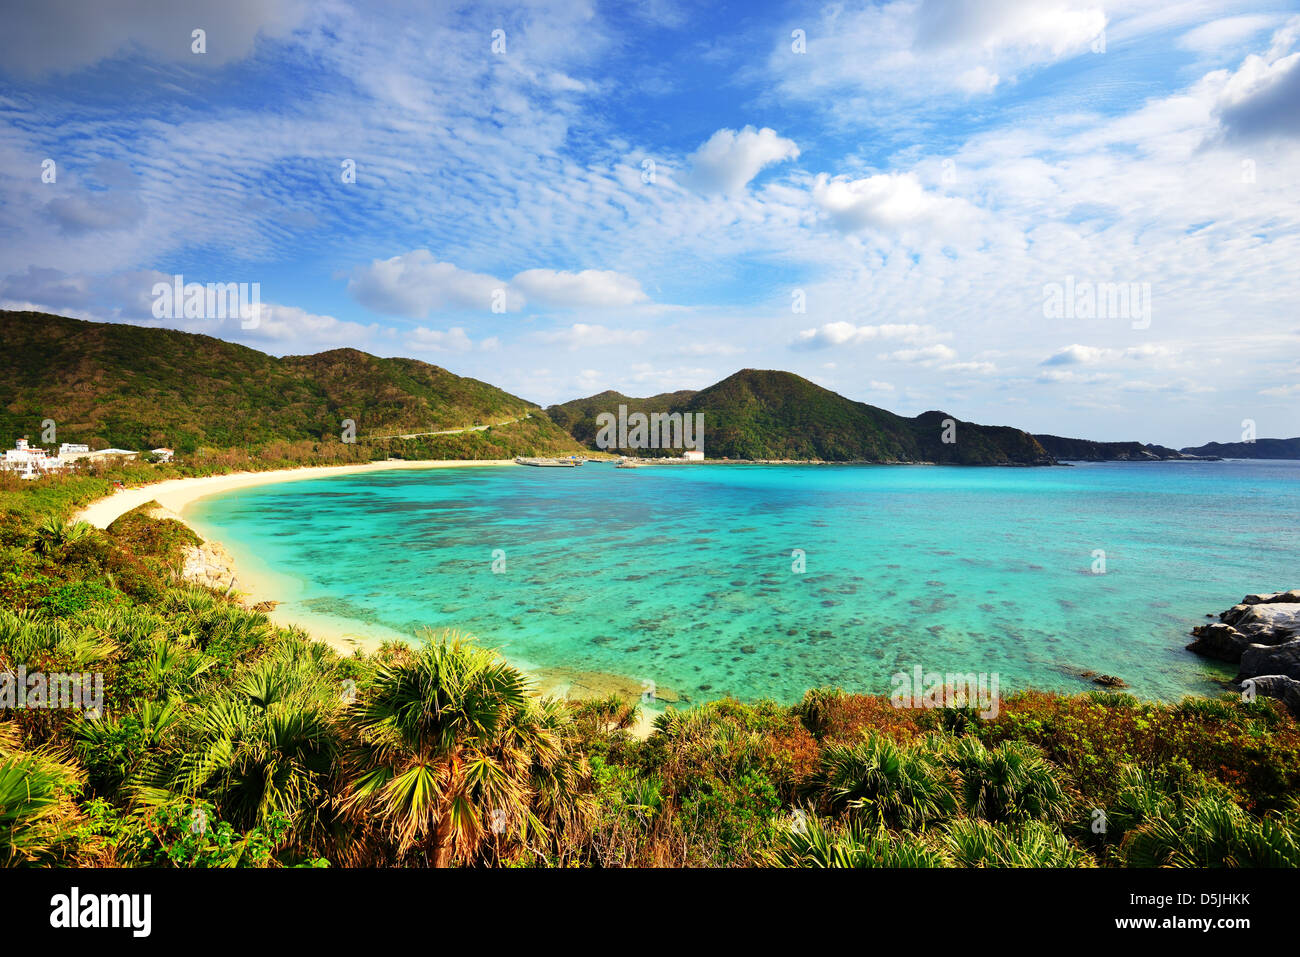 Aharen Beach sull'isola di Tokashiki a Okinawa, Giappone. Immagini Stock